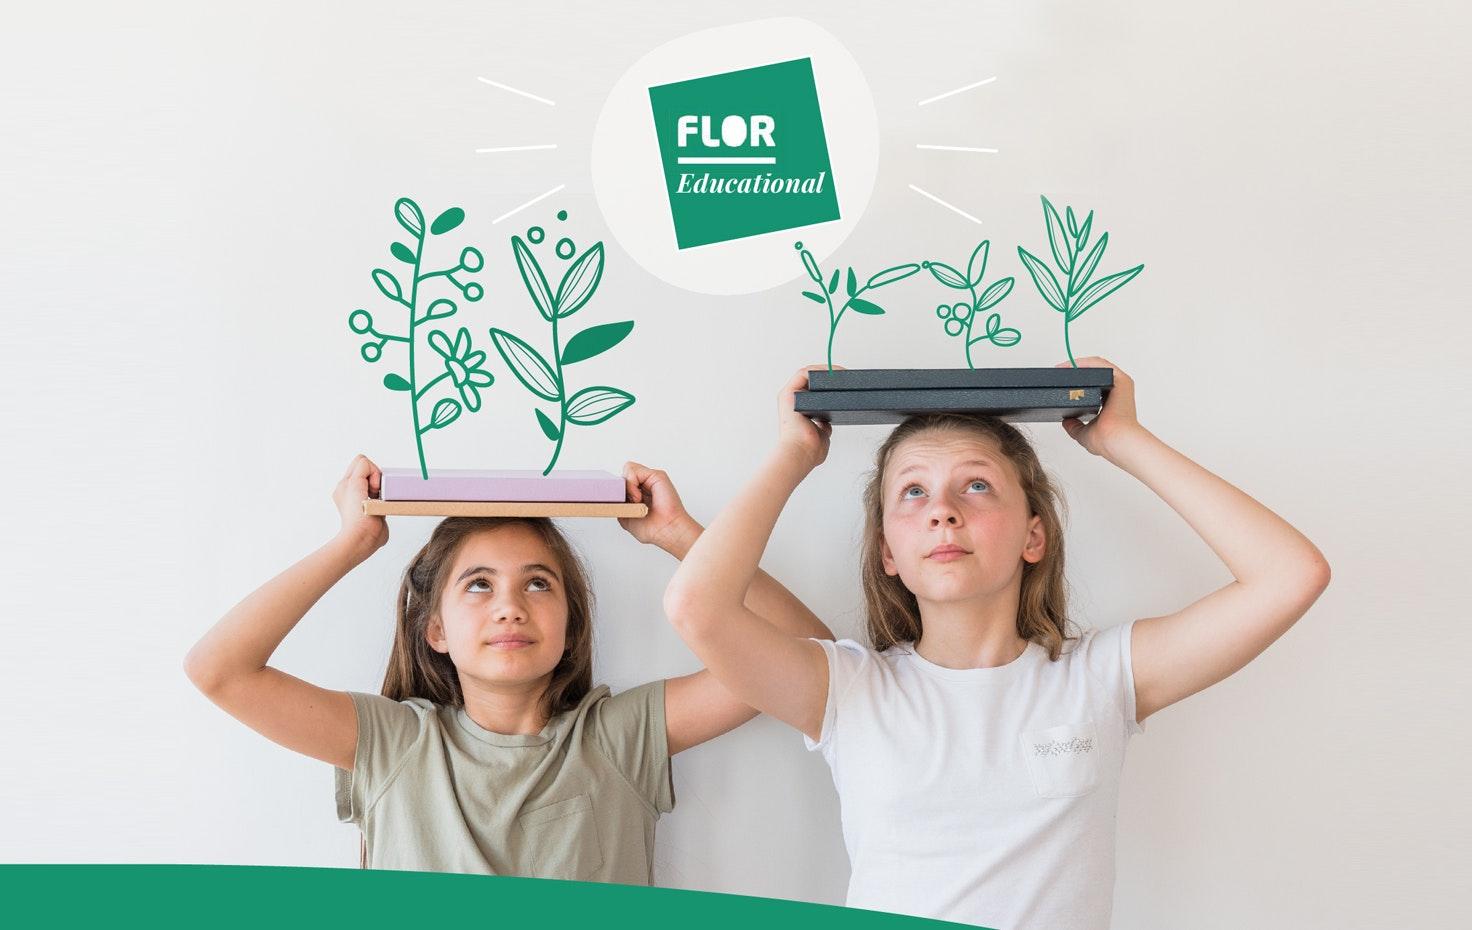 Flor Educational